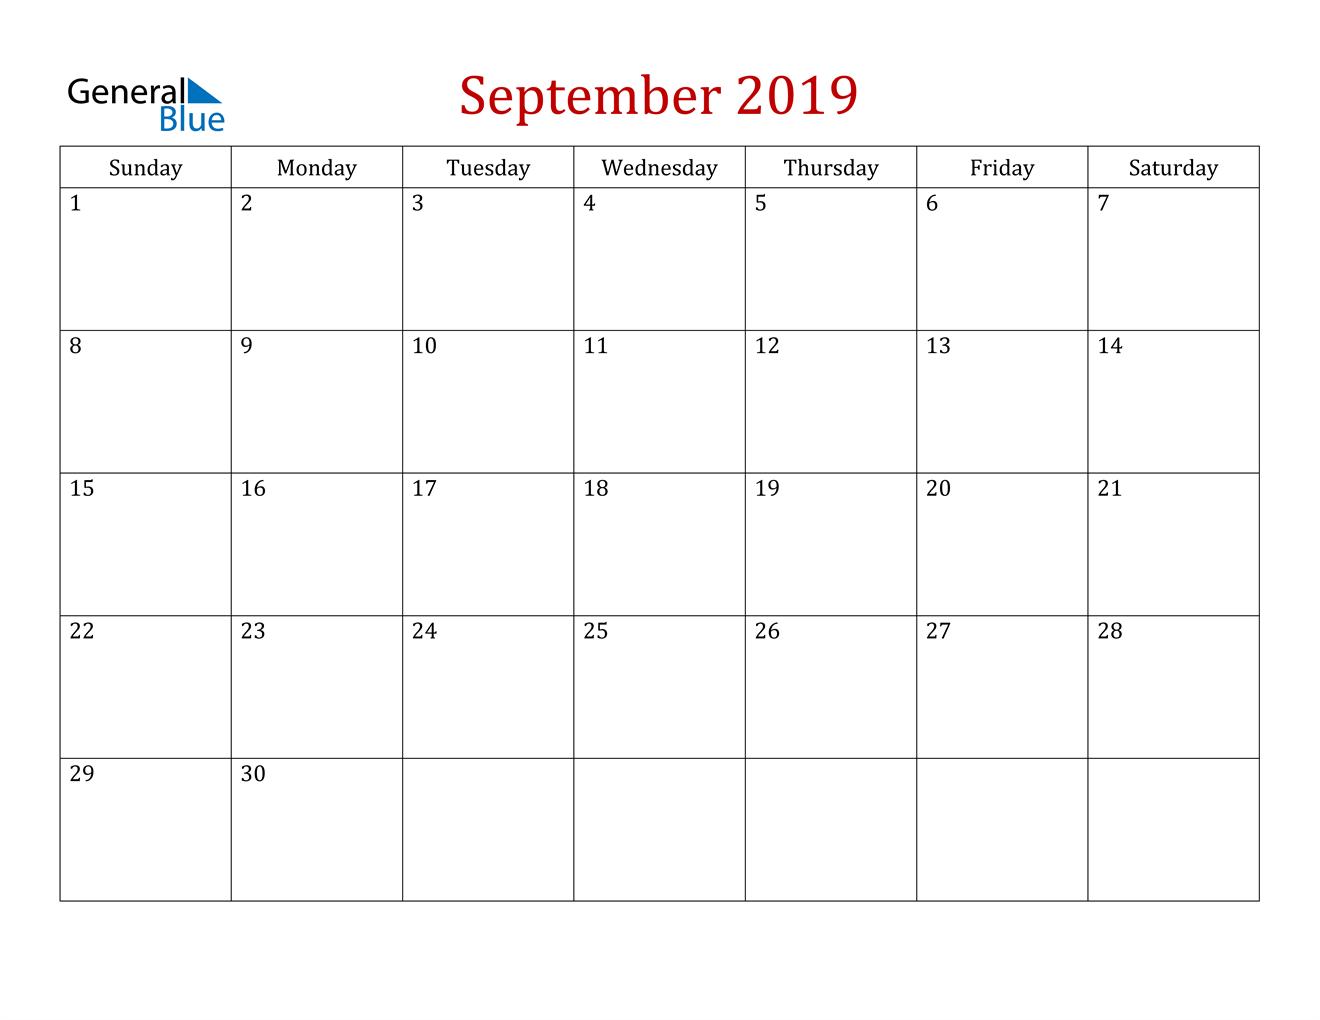 Image of September 2019 Dark and Red Professional Office Calendar Calendar